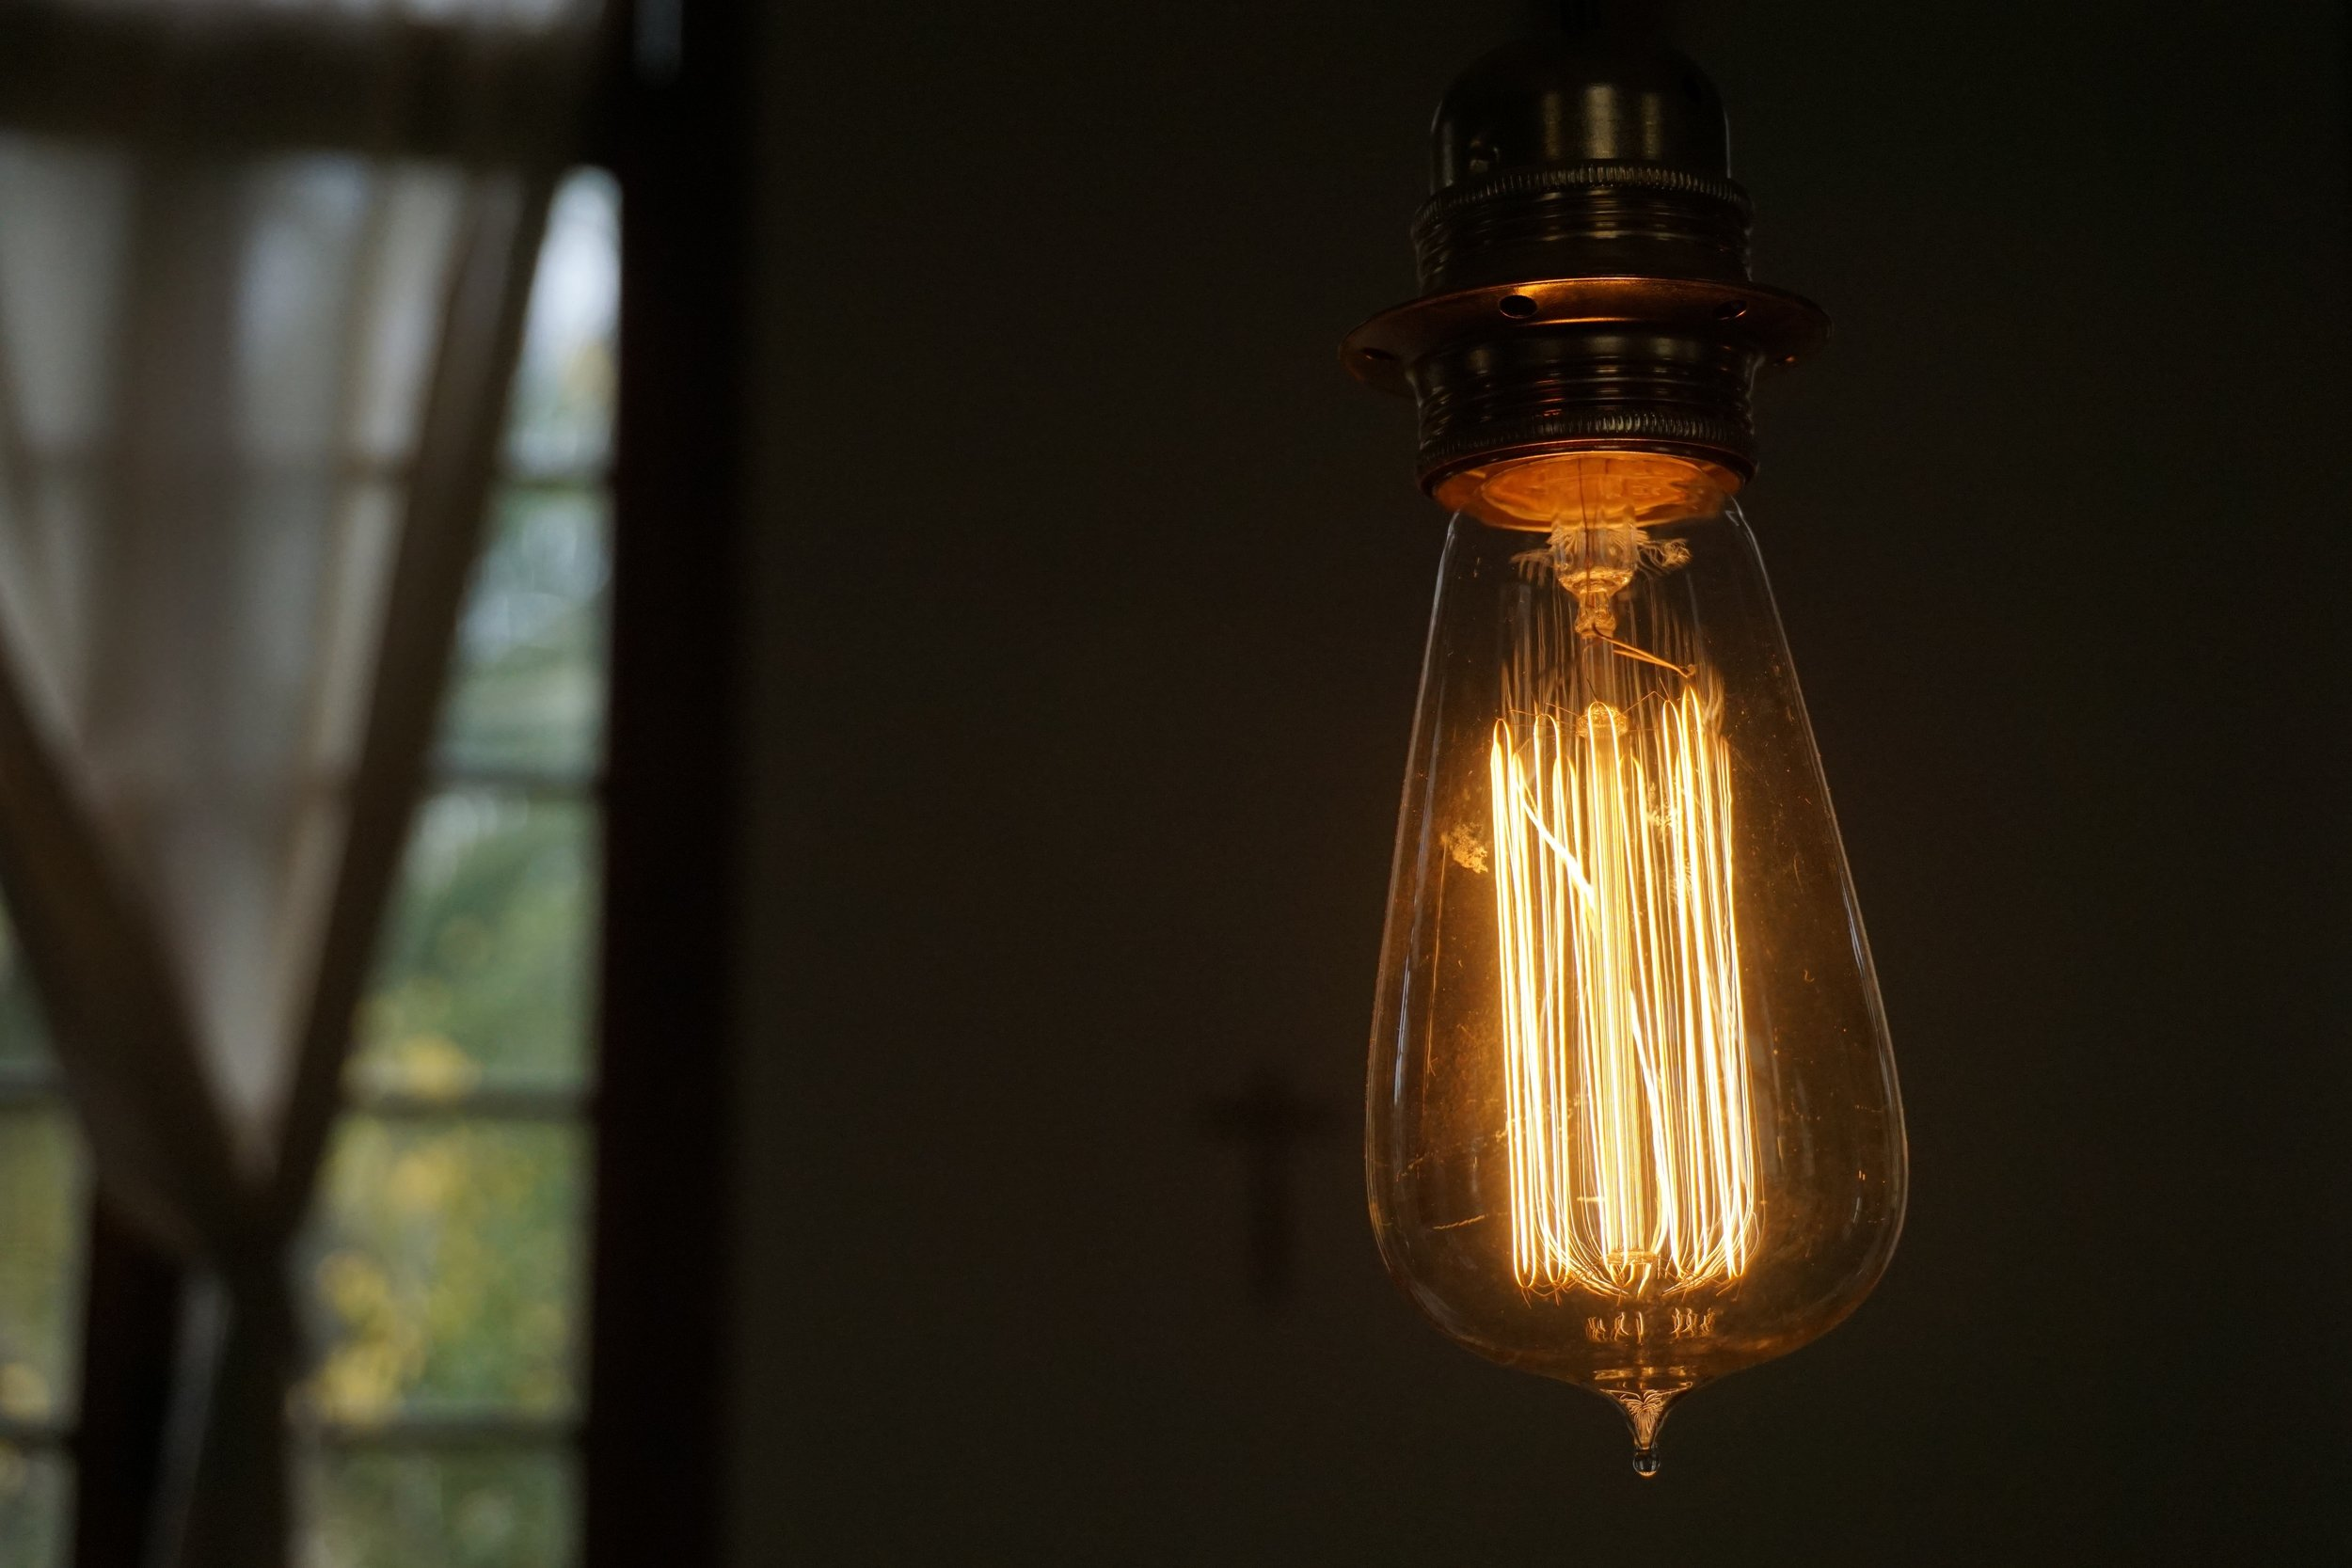 FOTO: Lâmpada